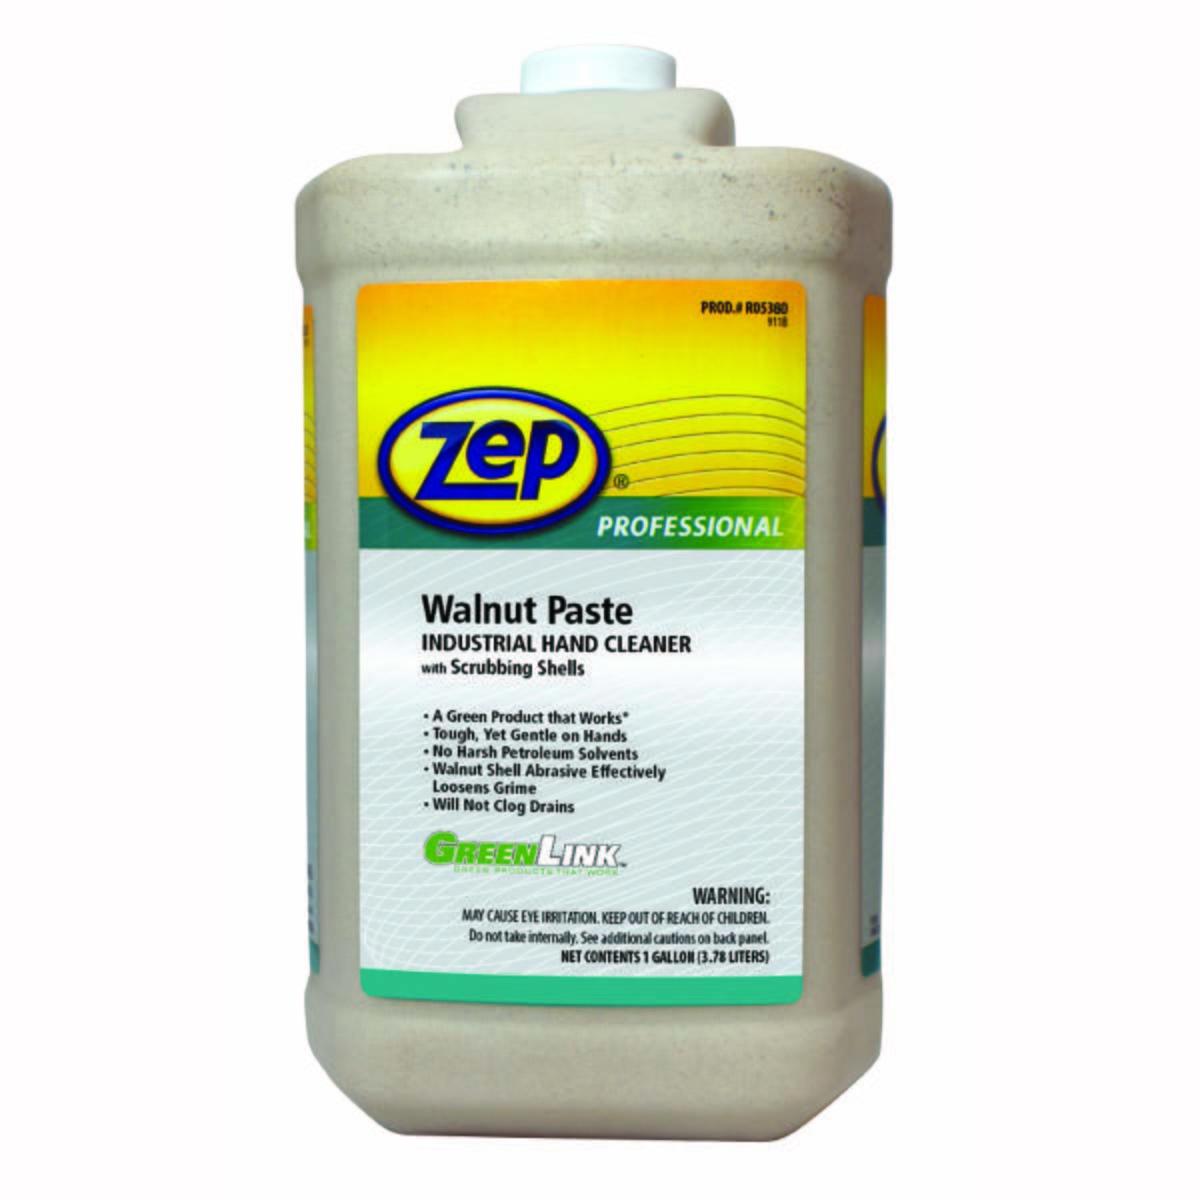 ZEP Walnut Paste Industrial Hand Cleaner With Scrubbing Shells